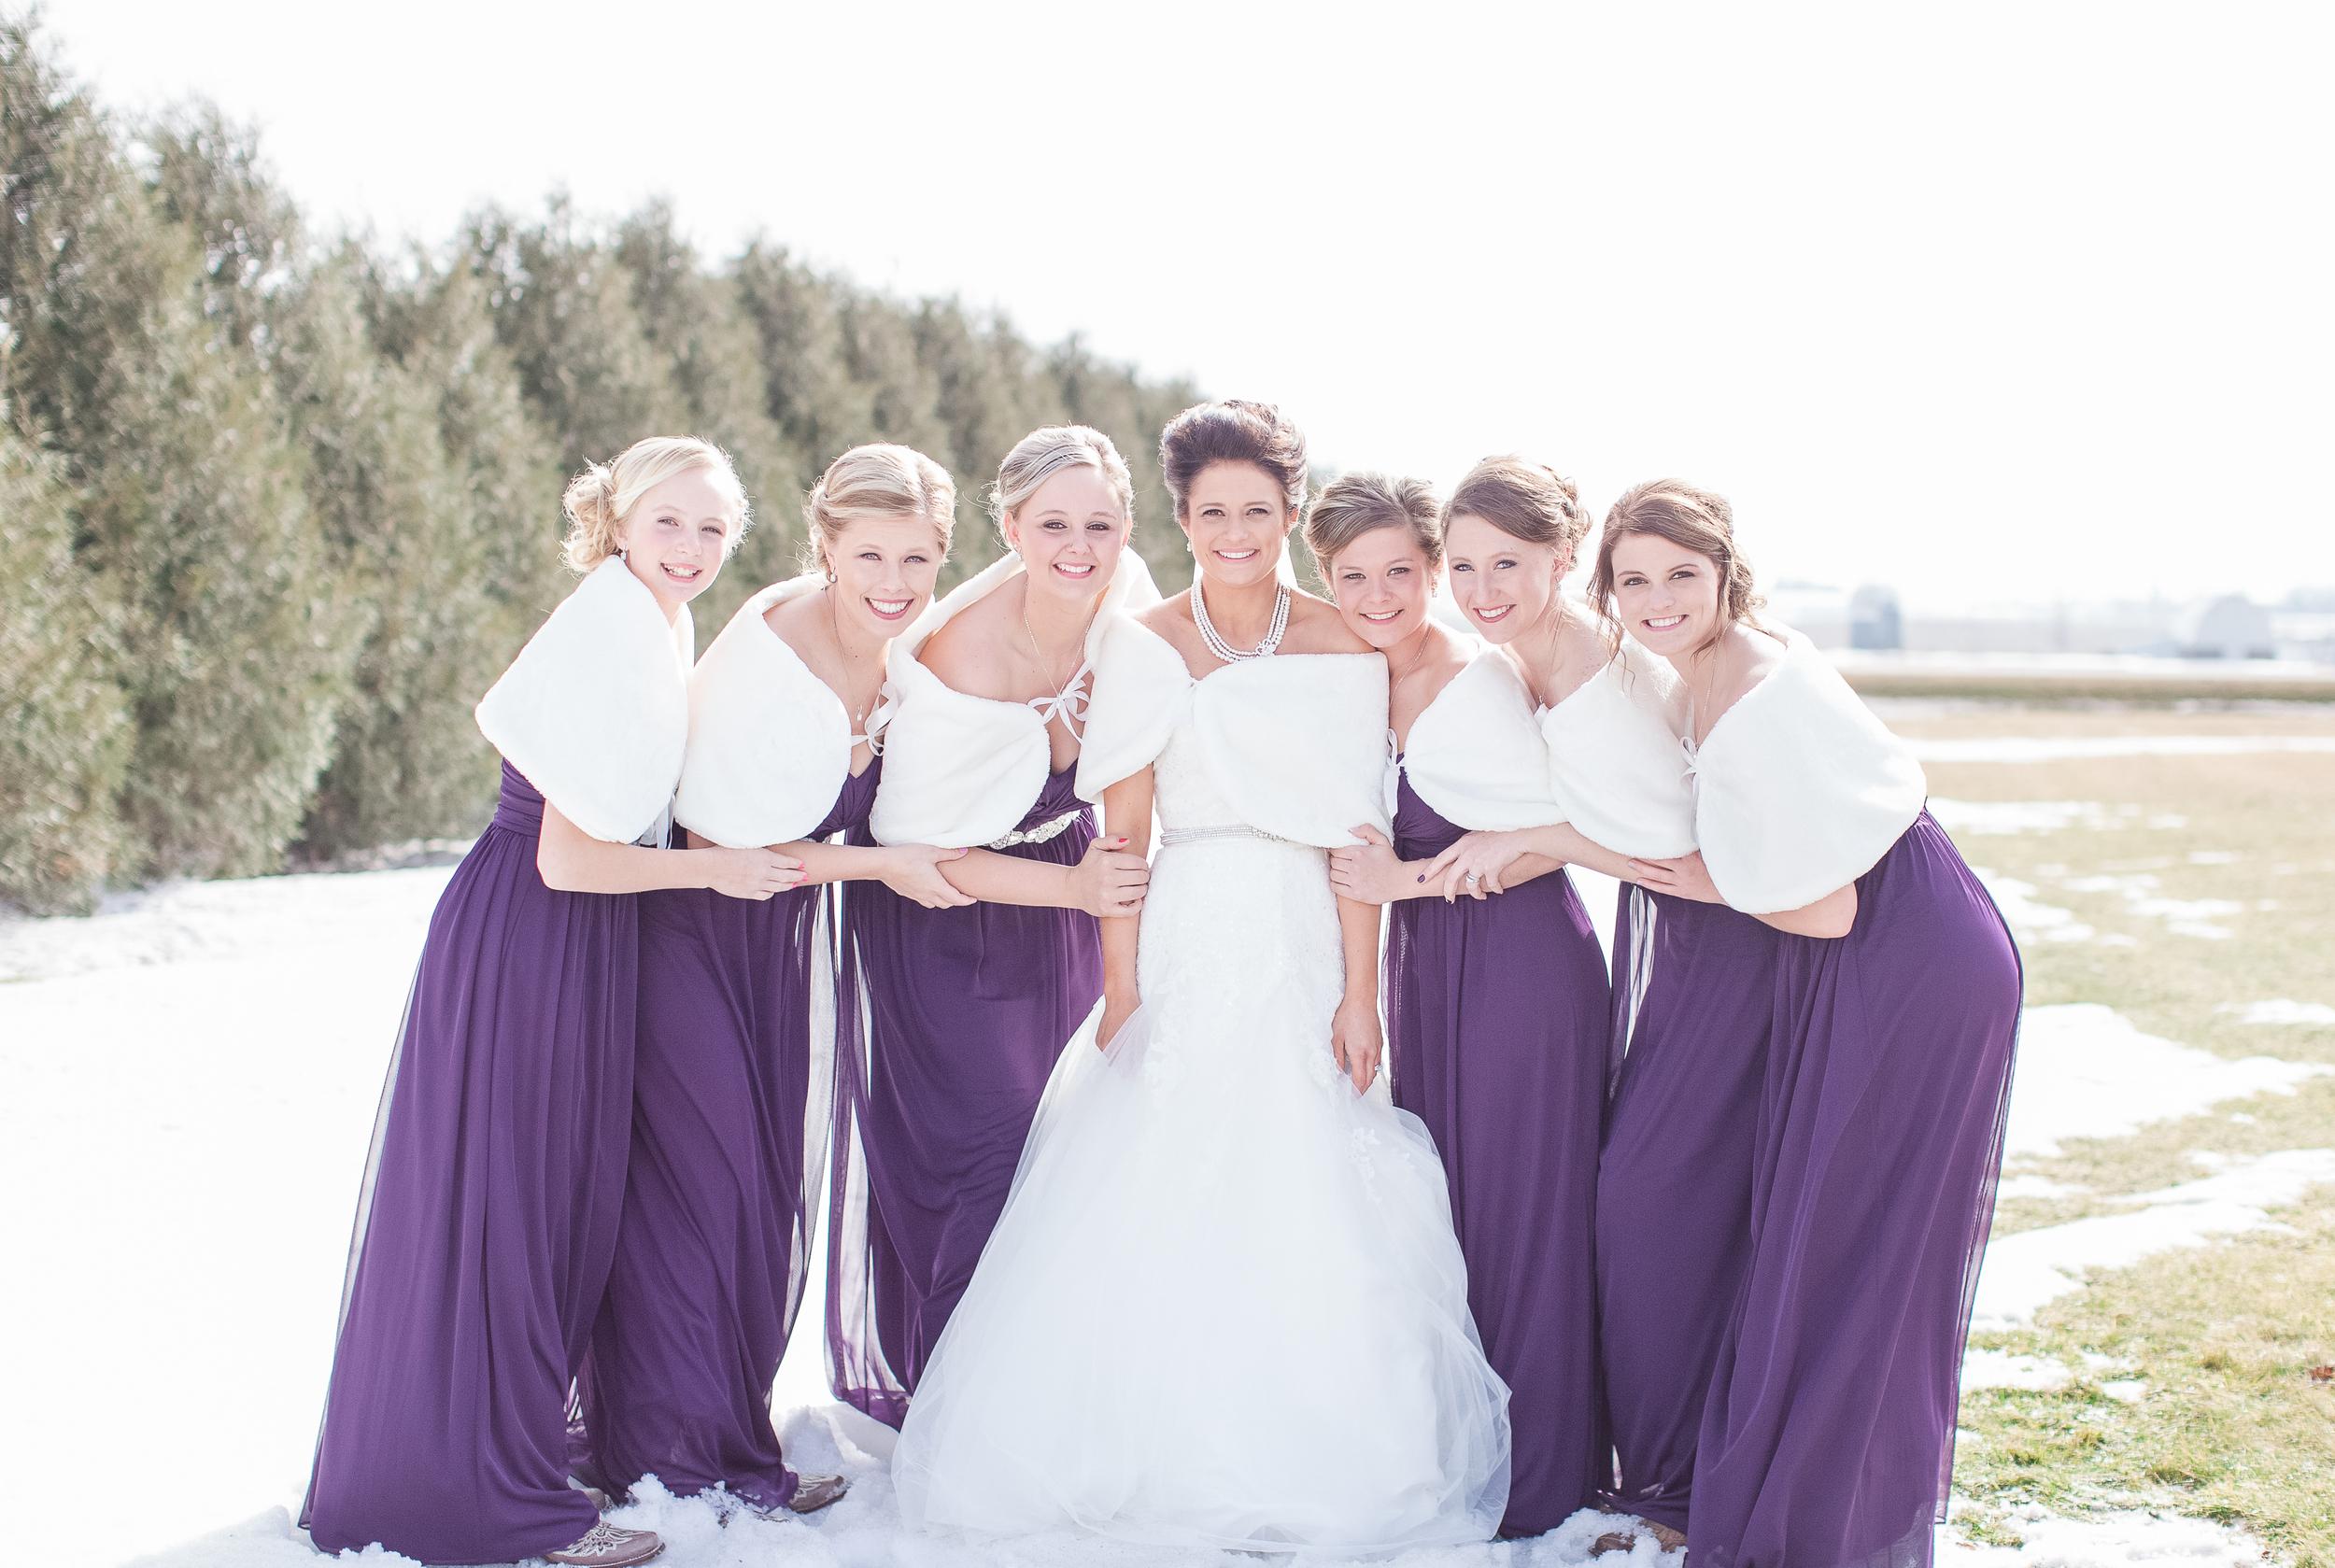 #bridesmaids #purpledress #wedding #winterwedding